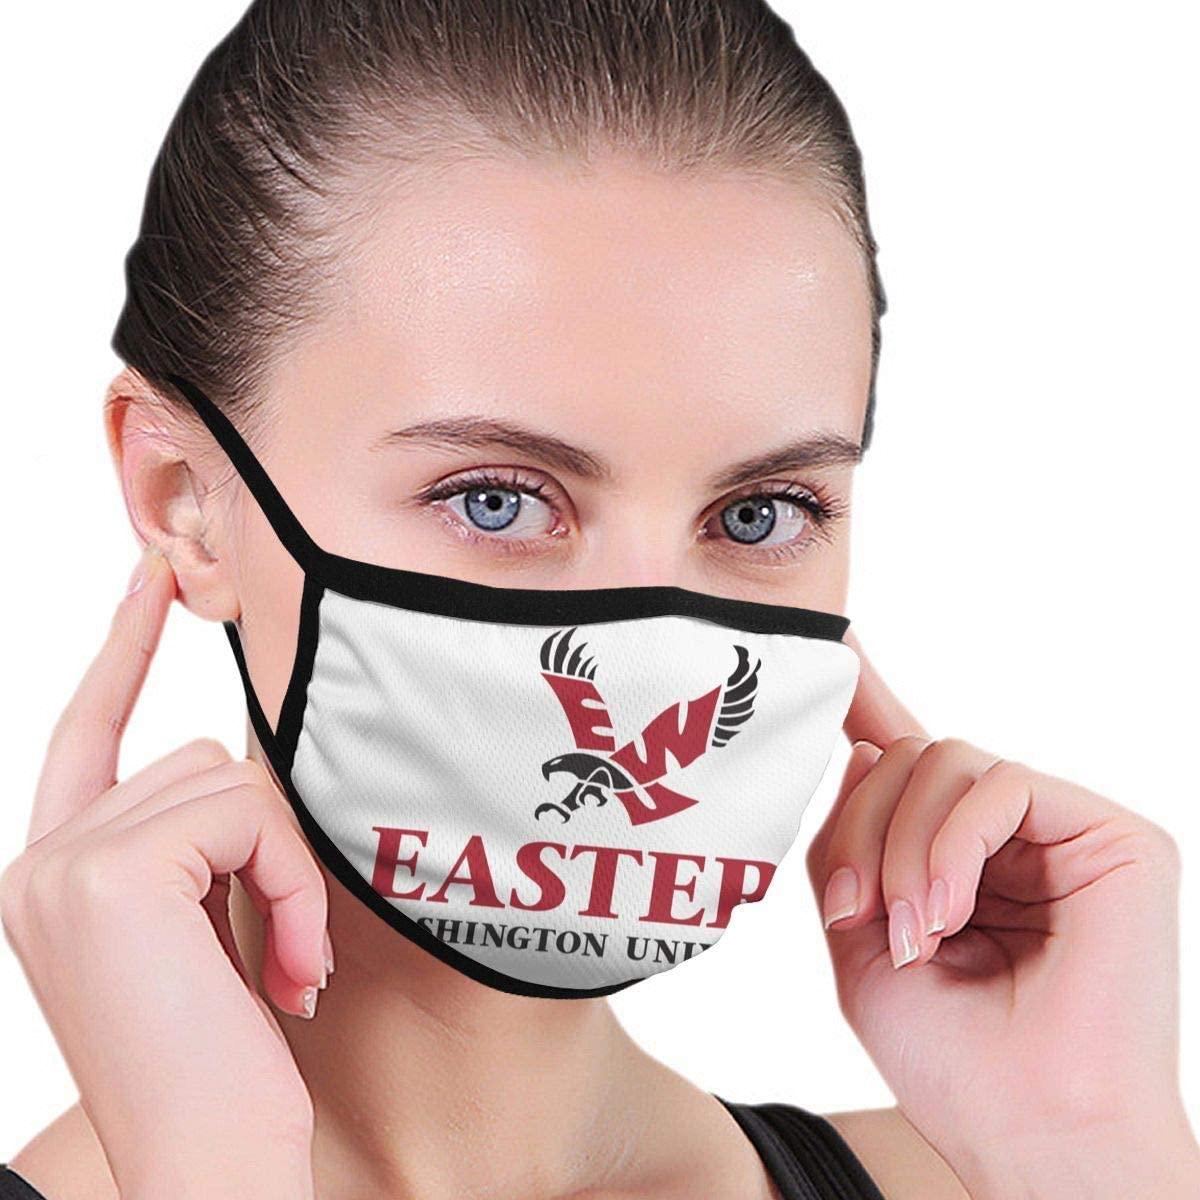 Ewu Commemorate Outdoor Decorative Face Protection Face Cover Bandana Gaiter Balaclava Scarf Headwear